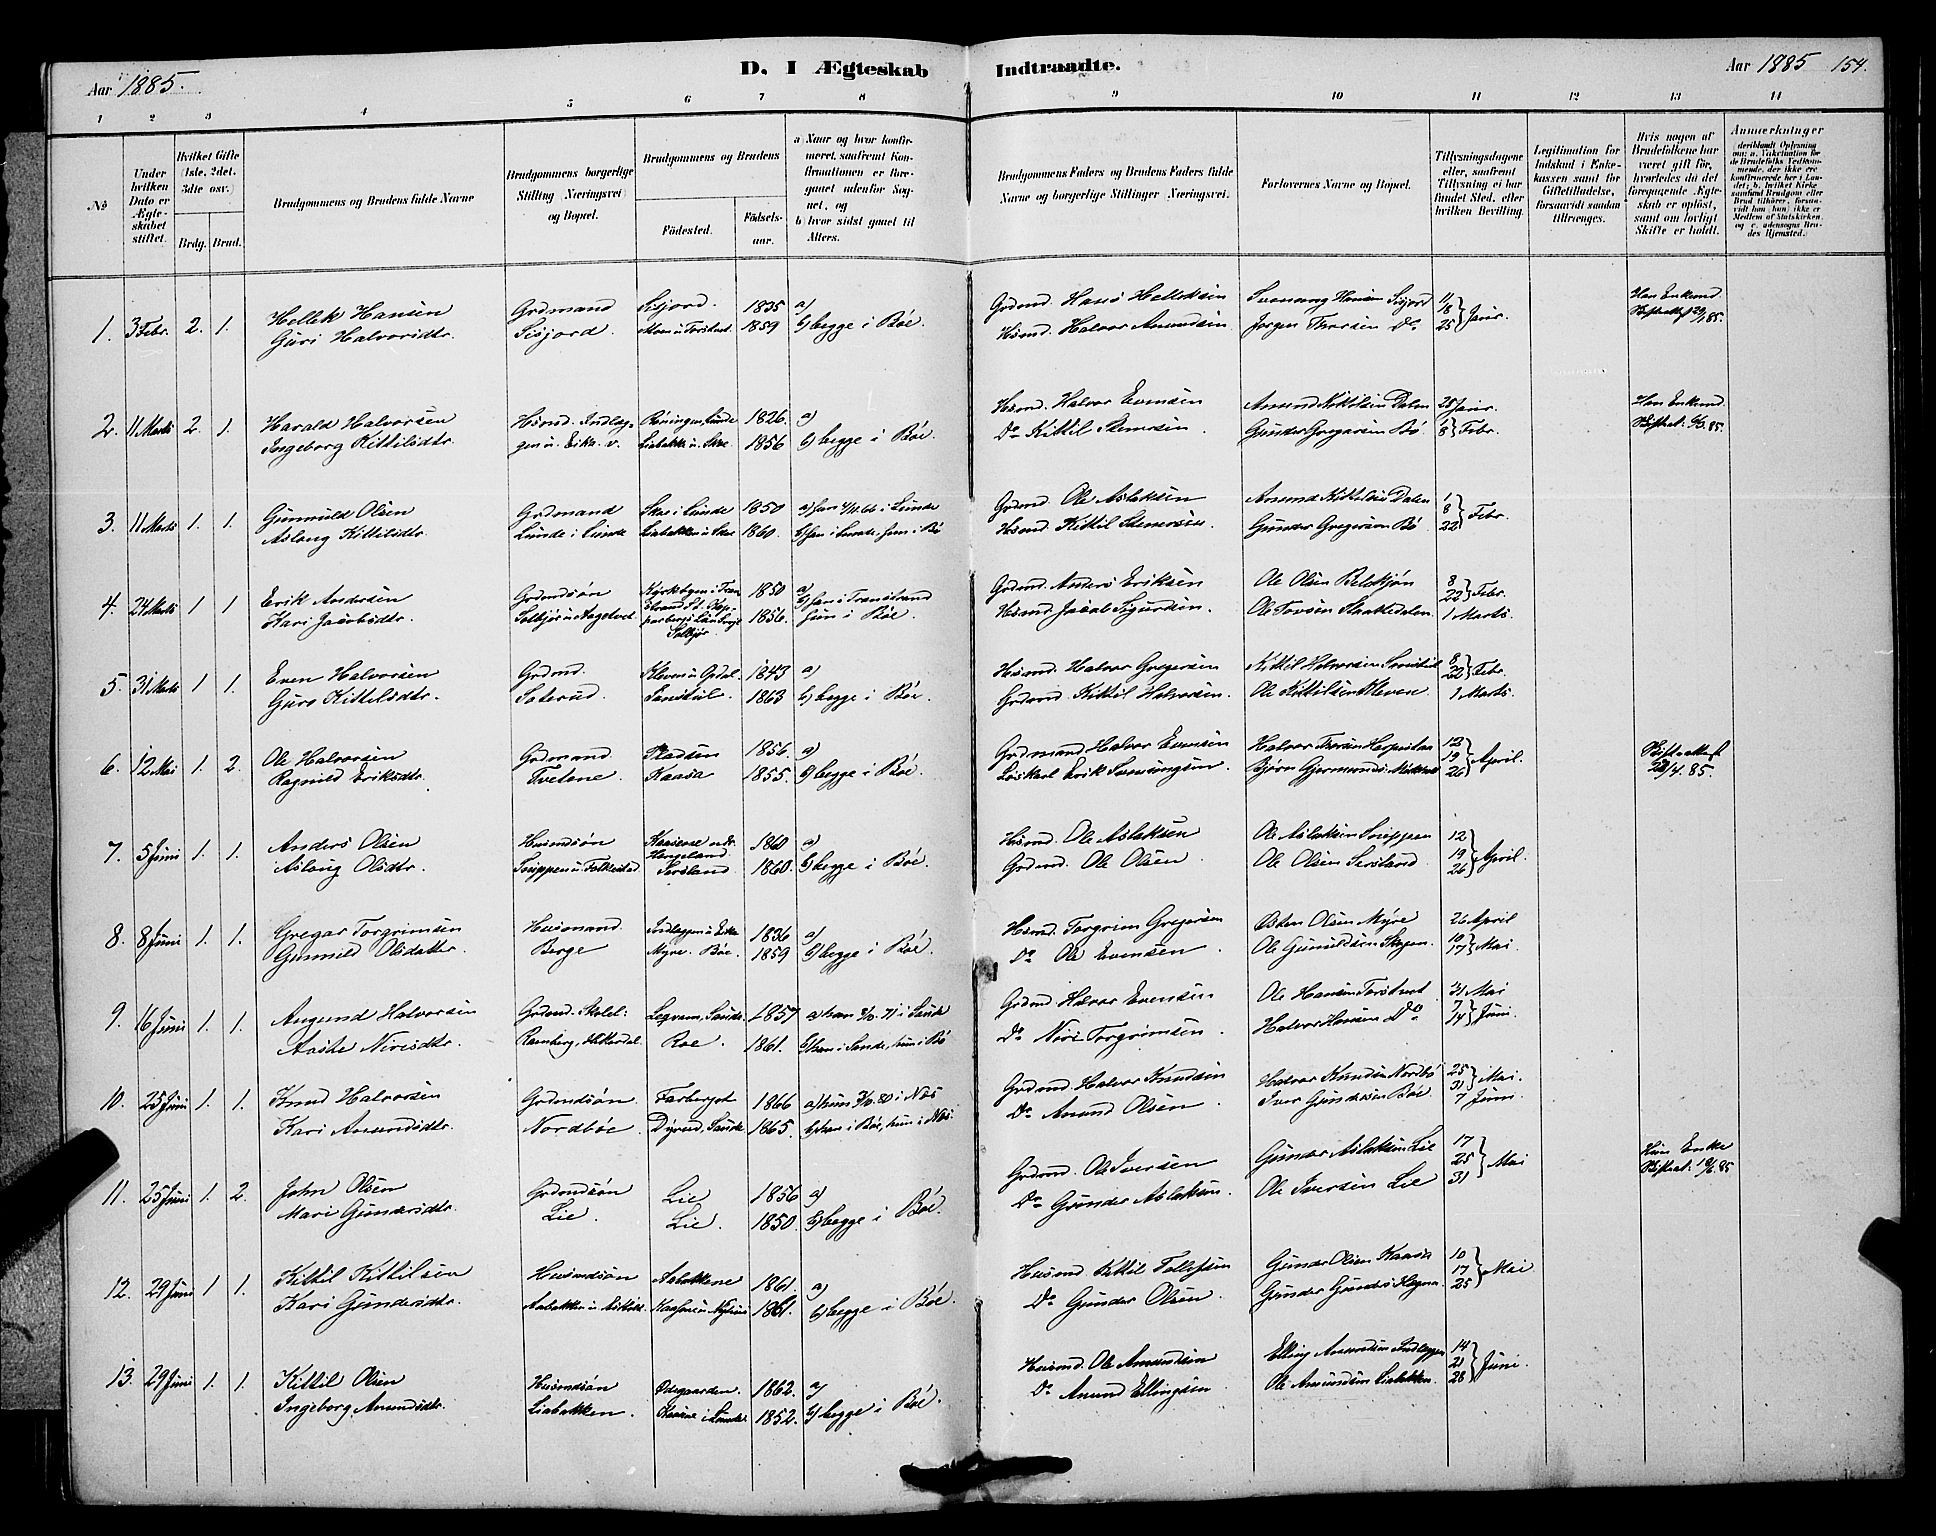 SAKO, Bø kirkebøker, G/Ga/L0005: Klokkerbok nr. 5, 1883-1897, s. 154